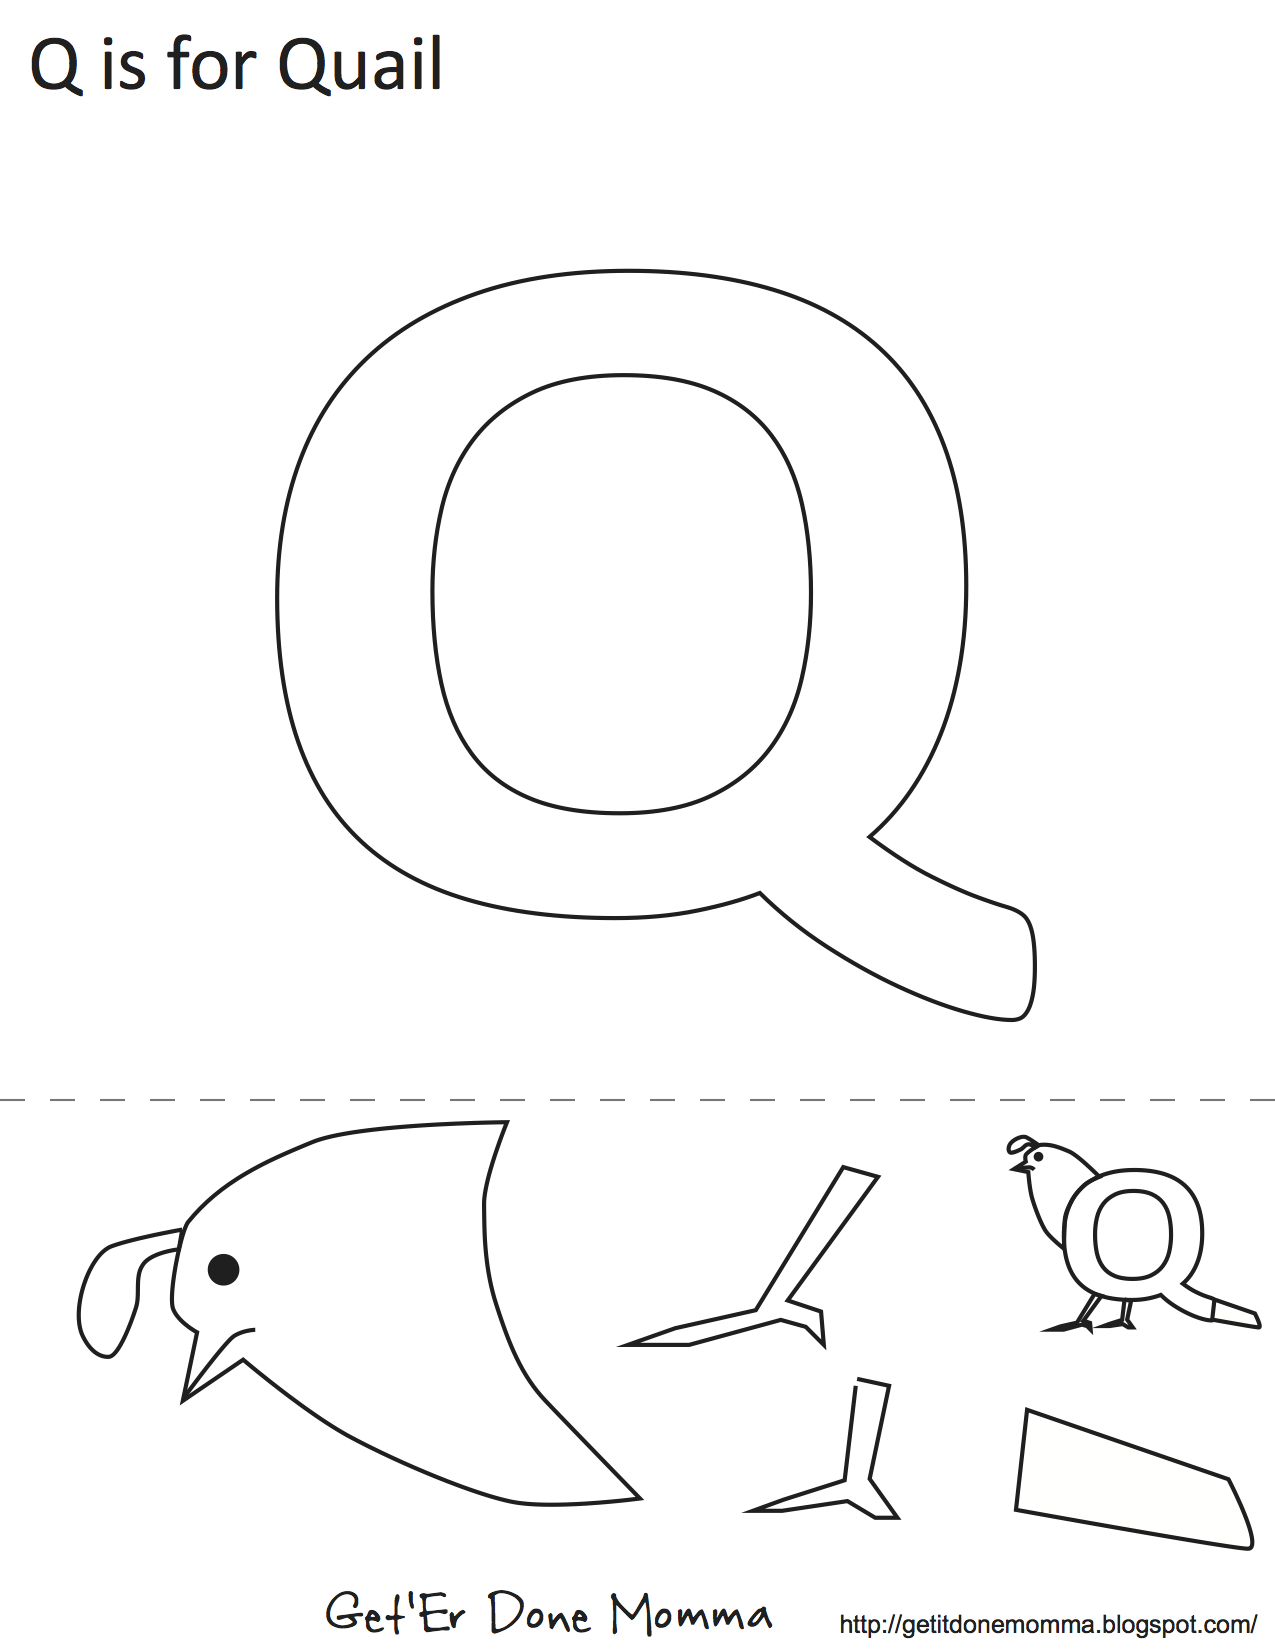 Letter Q Quail